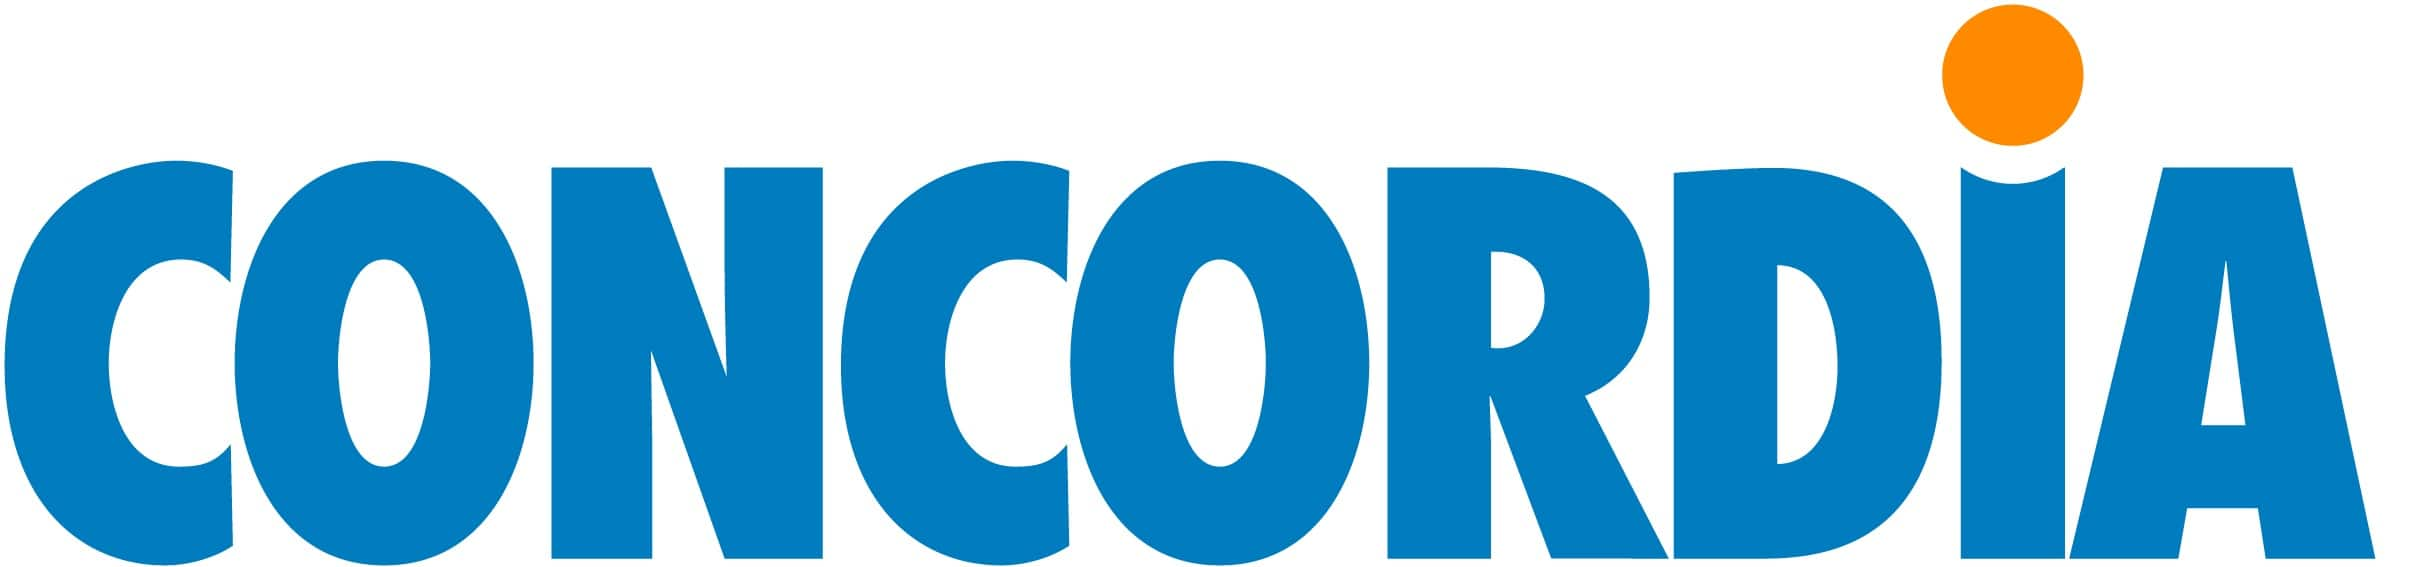 Concordia-Logo-EU-Consulting-GmbH